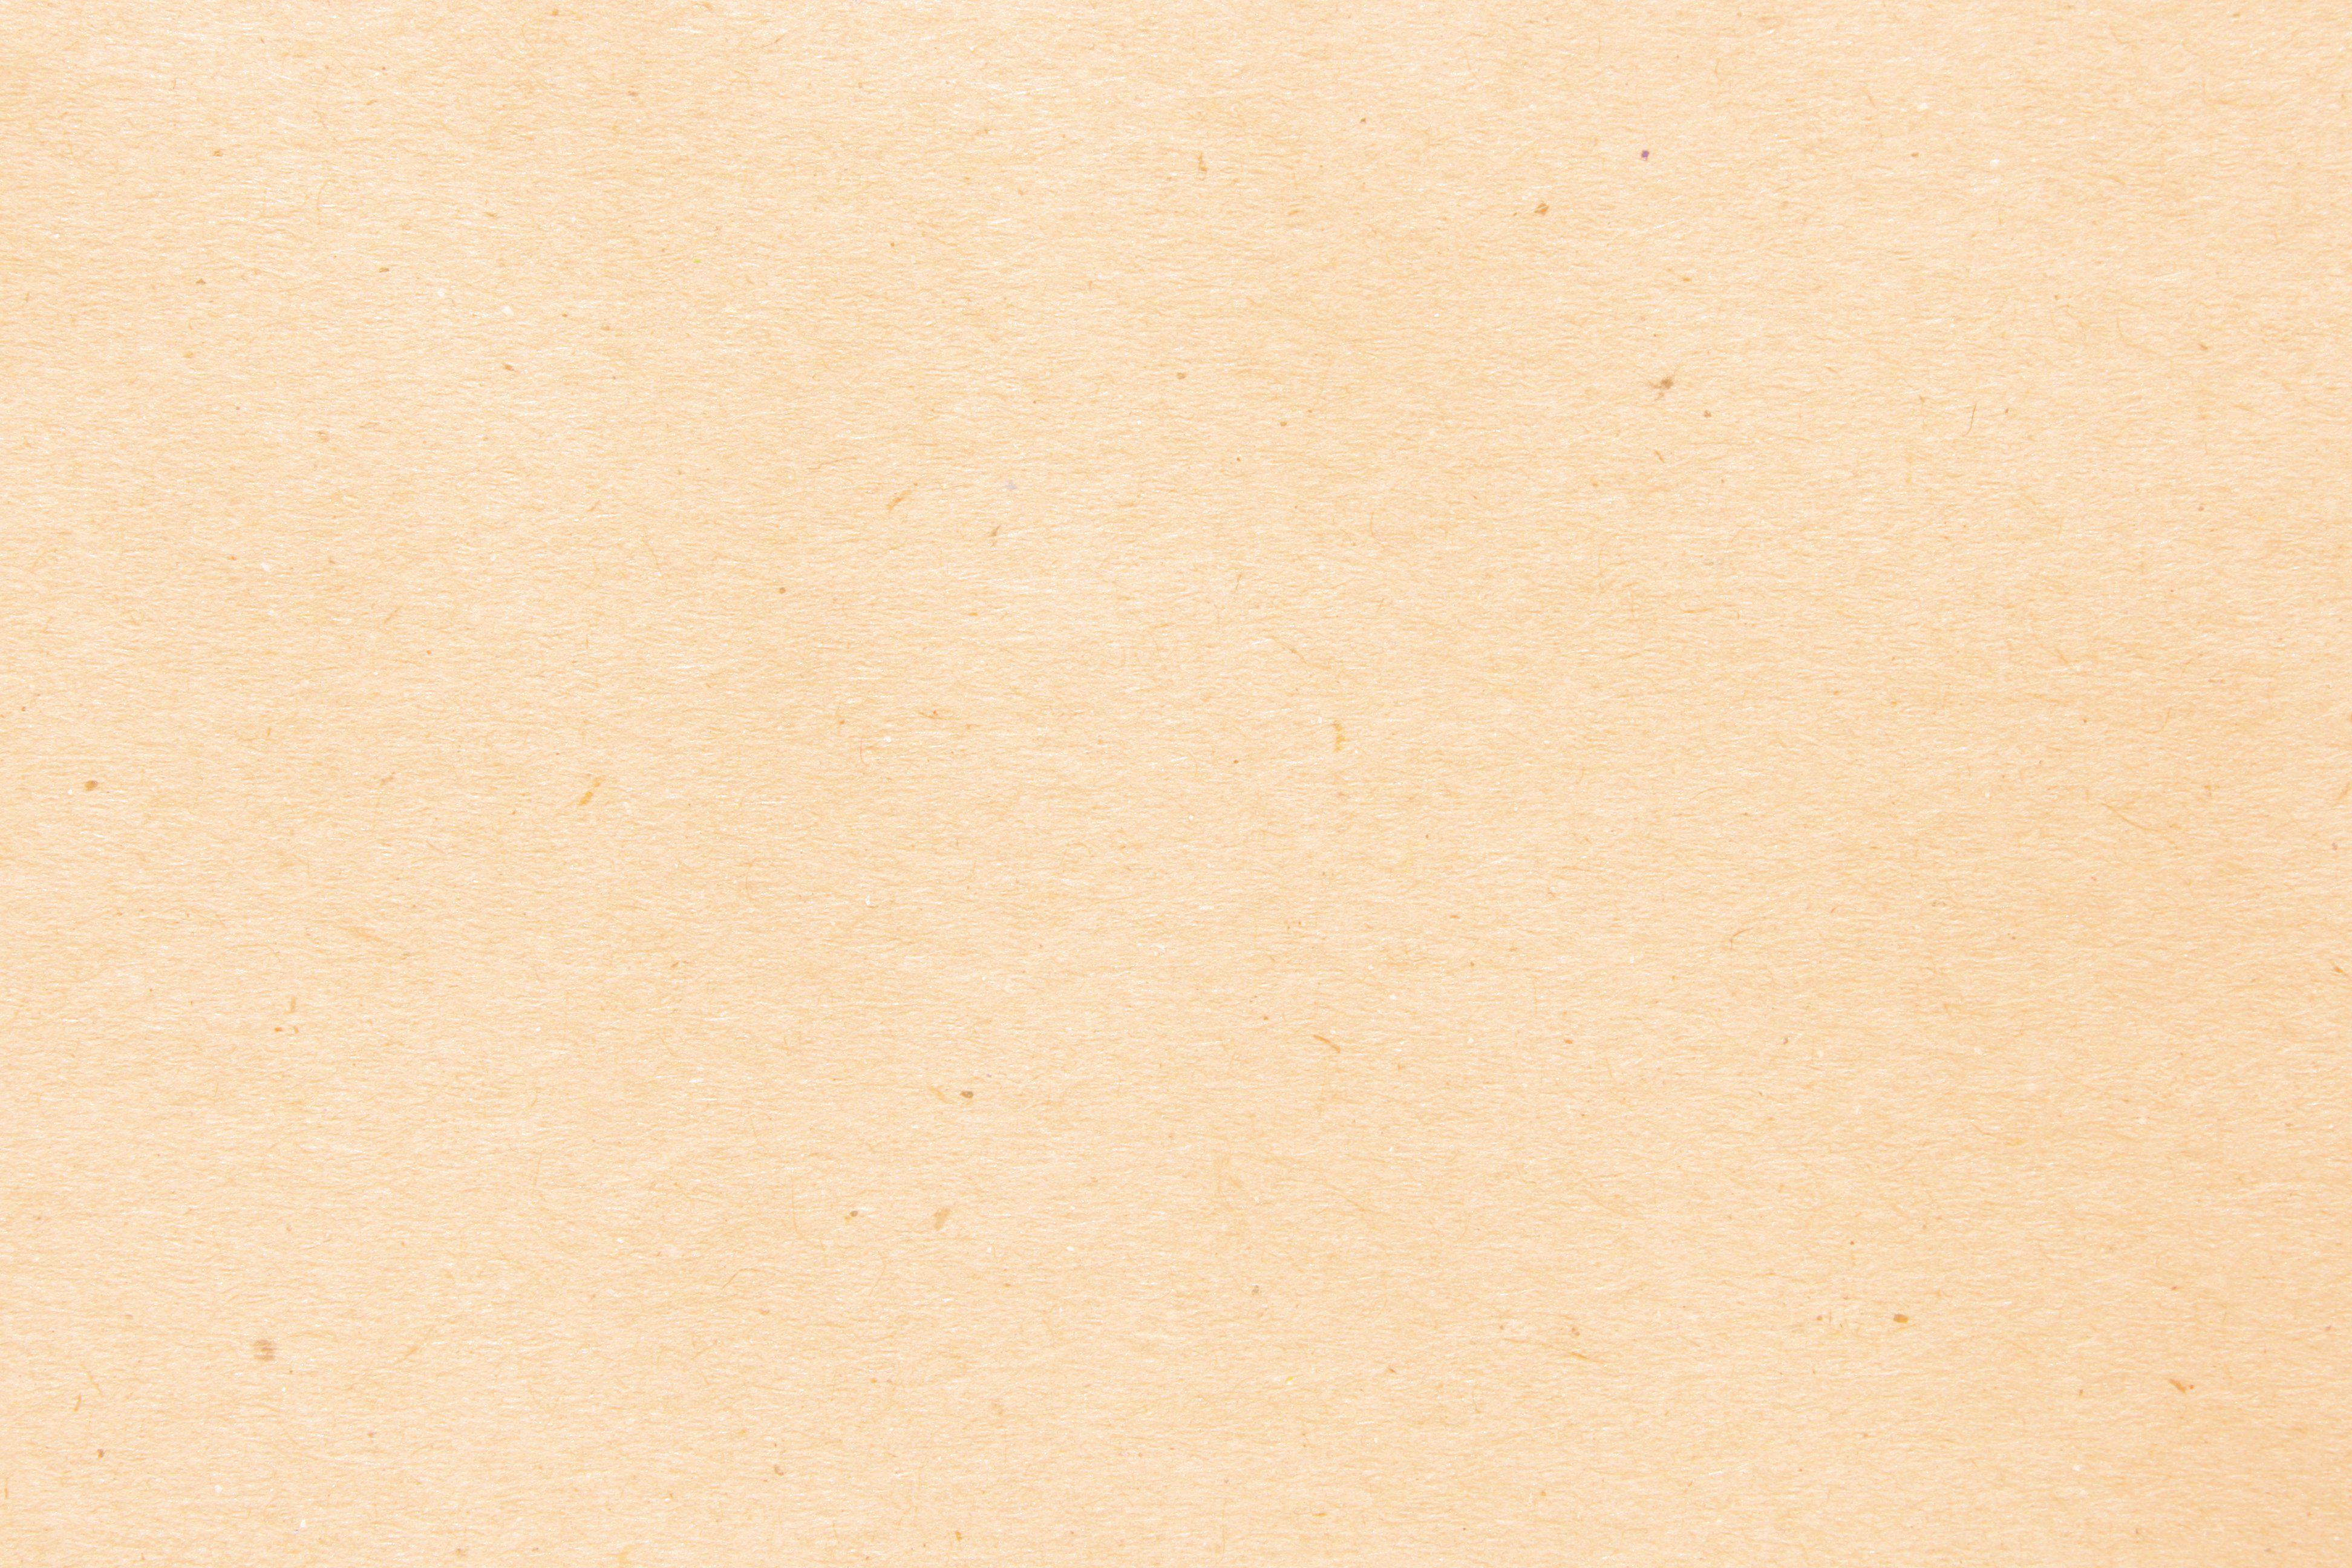 peachcoloredpapertexturewithflecksjpg 38882152592